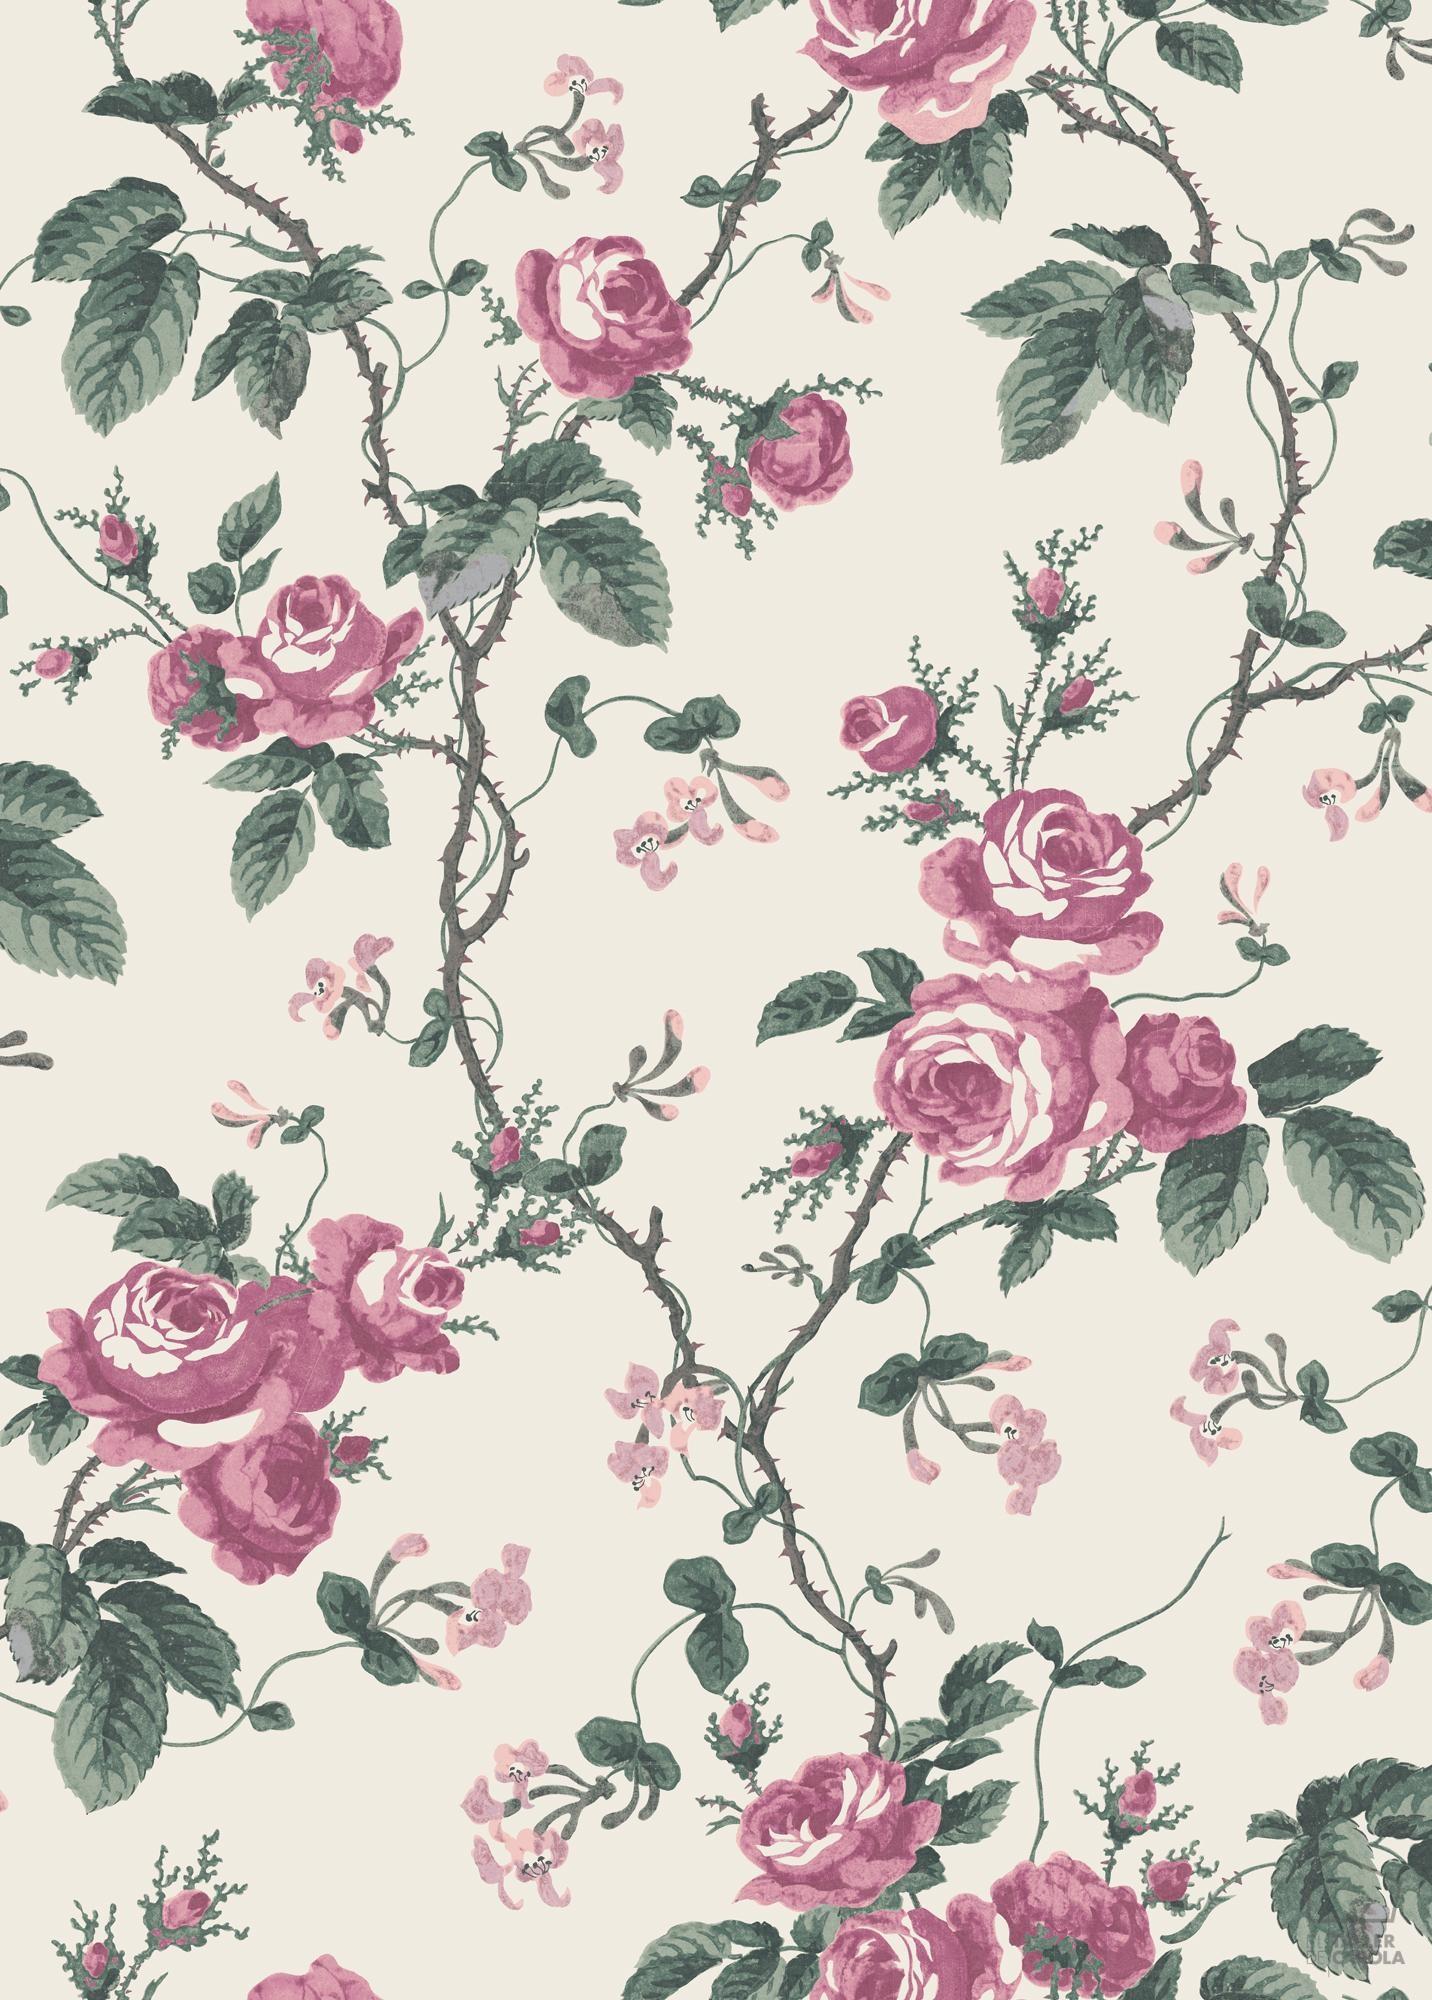 079fre7210-papel-pintado-flores-vintage-rosas3